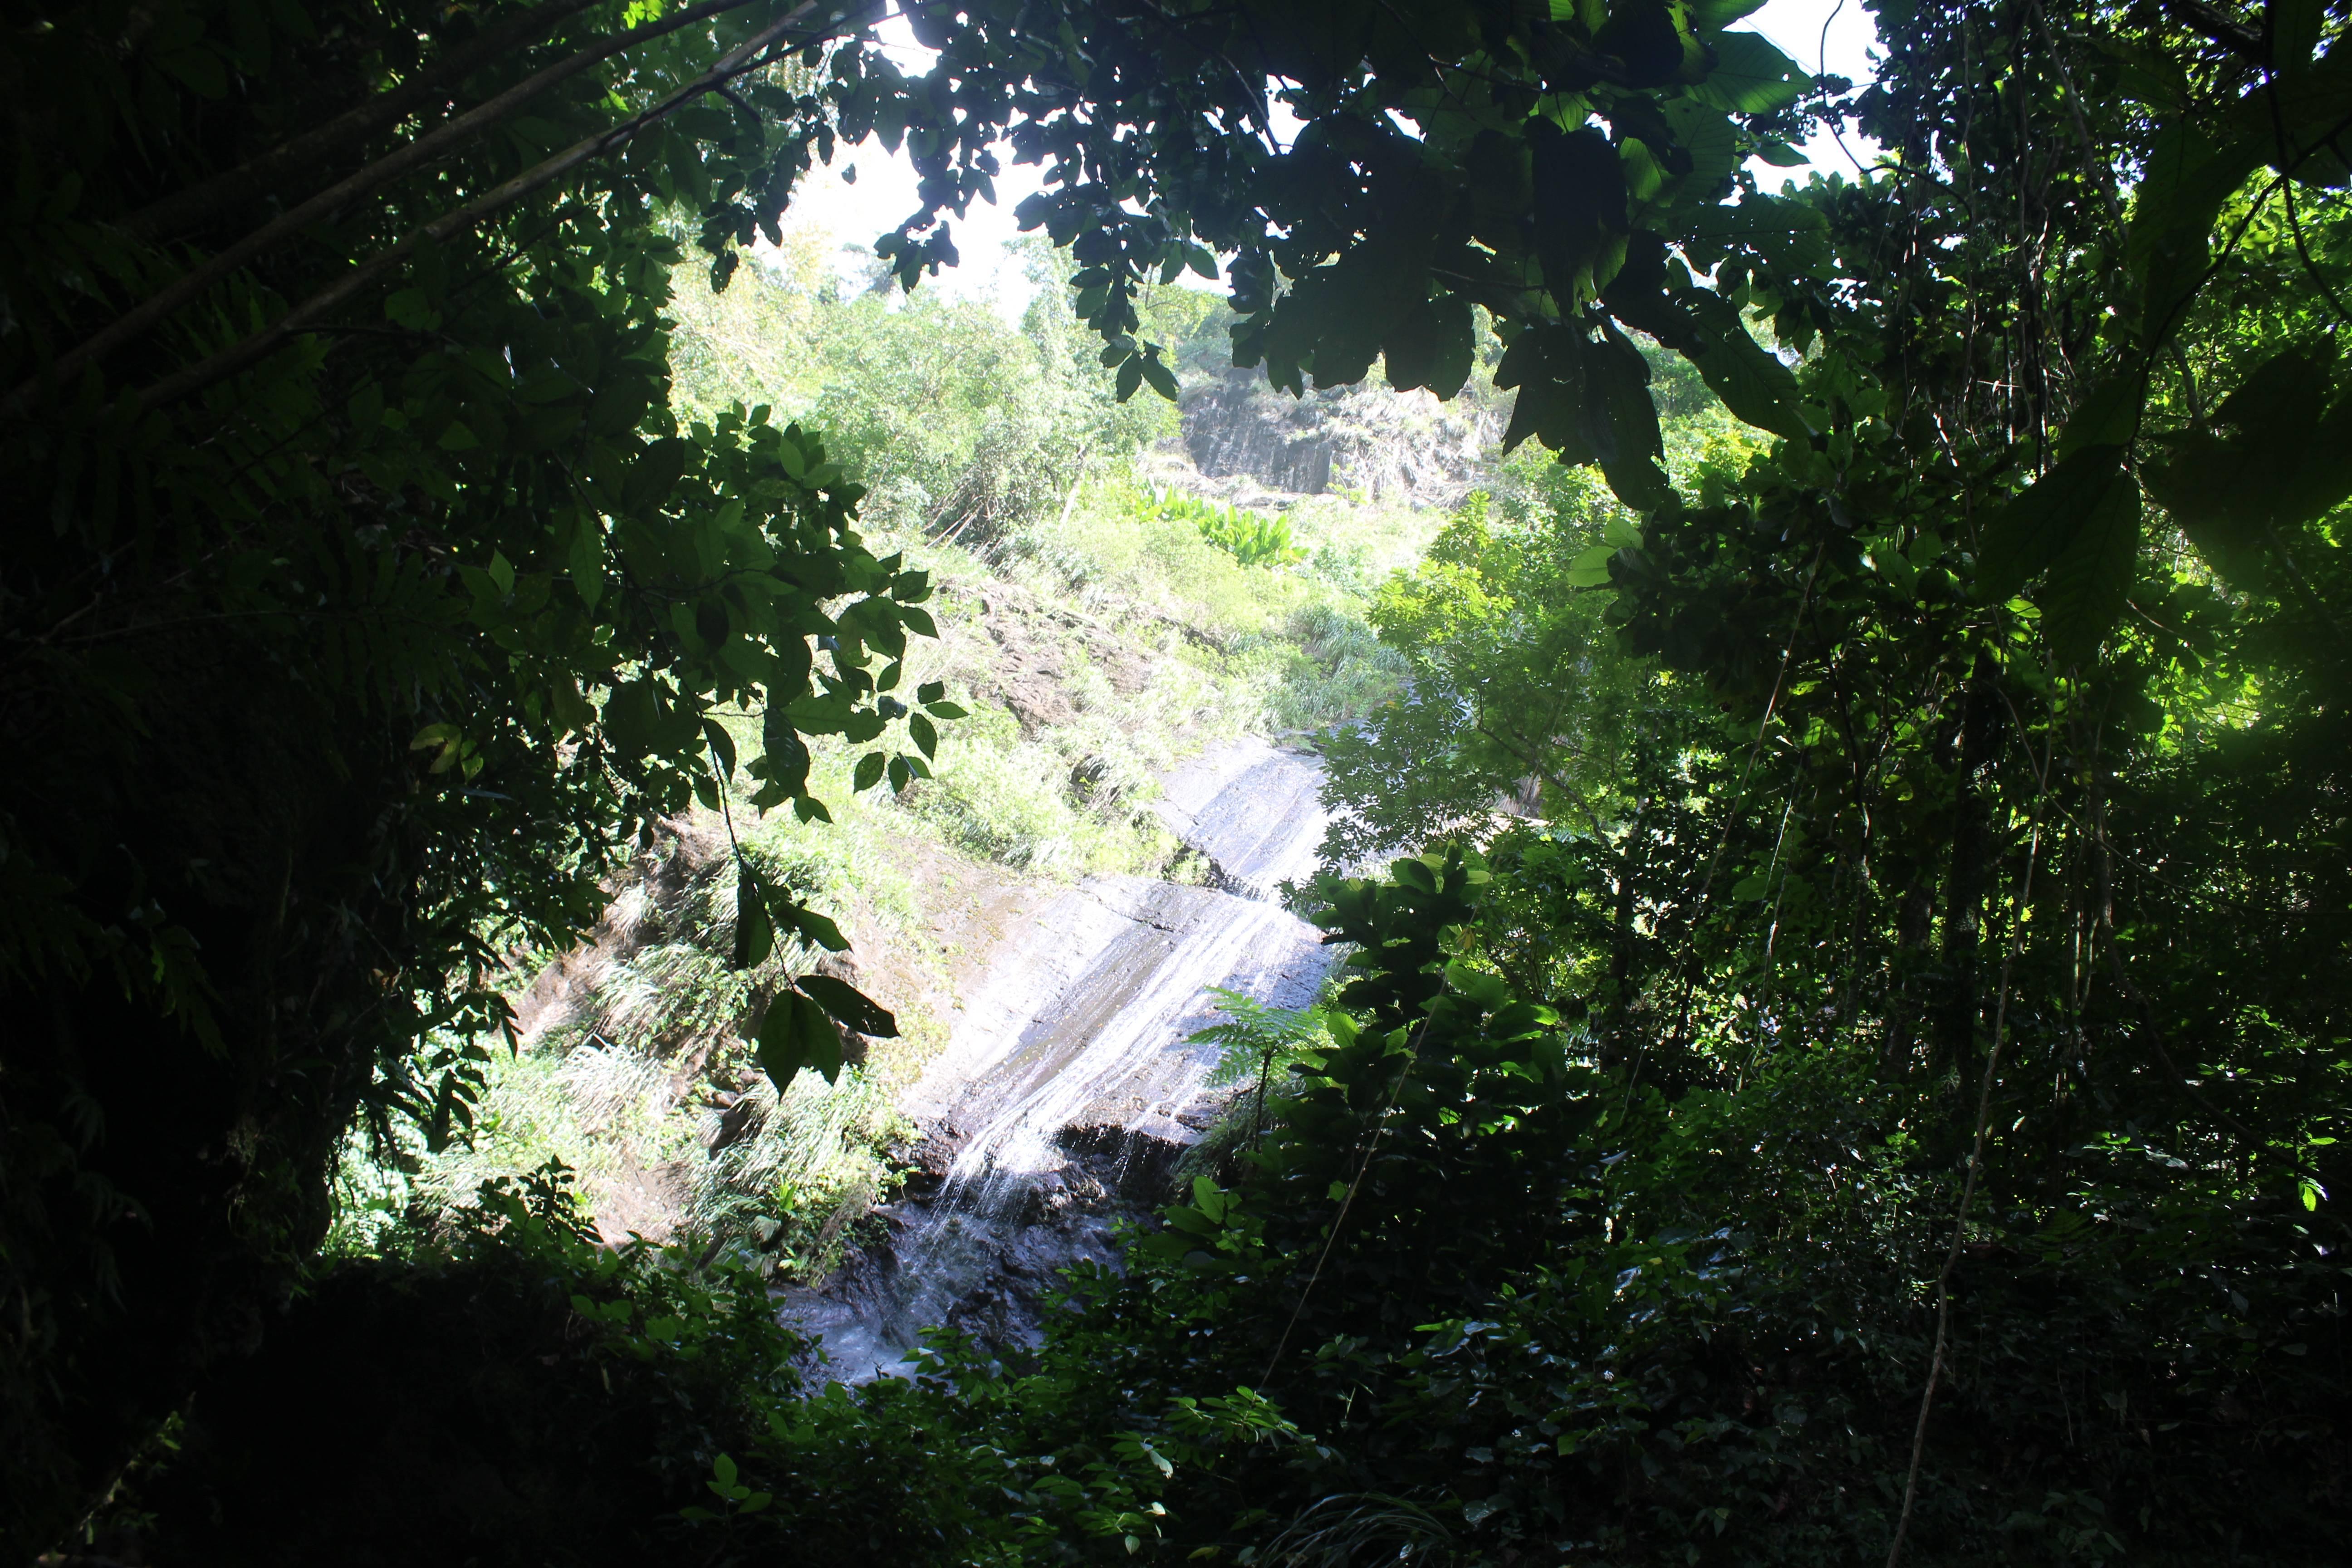 Photo 1: Martinique cascade couleuvre